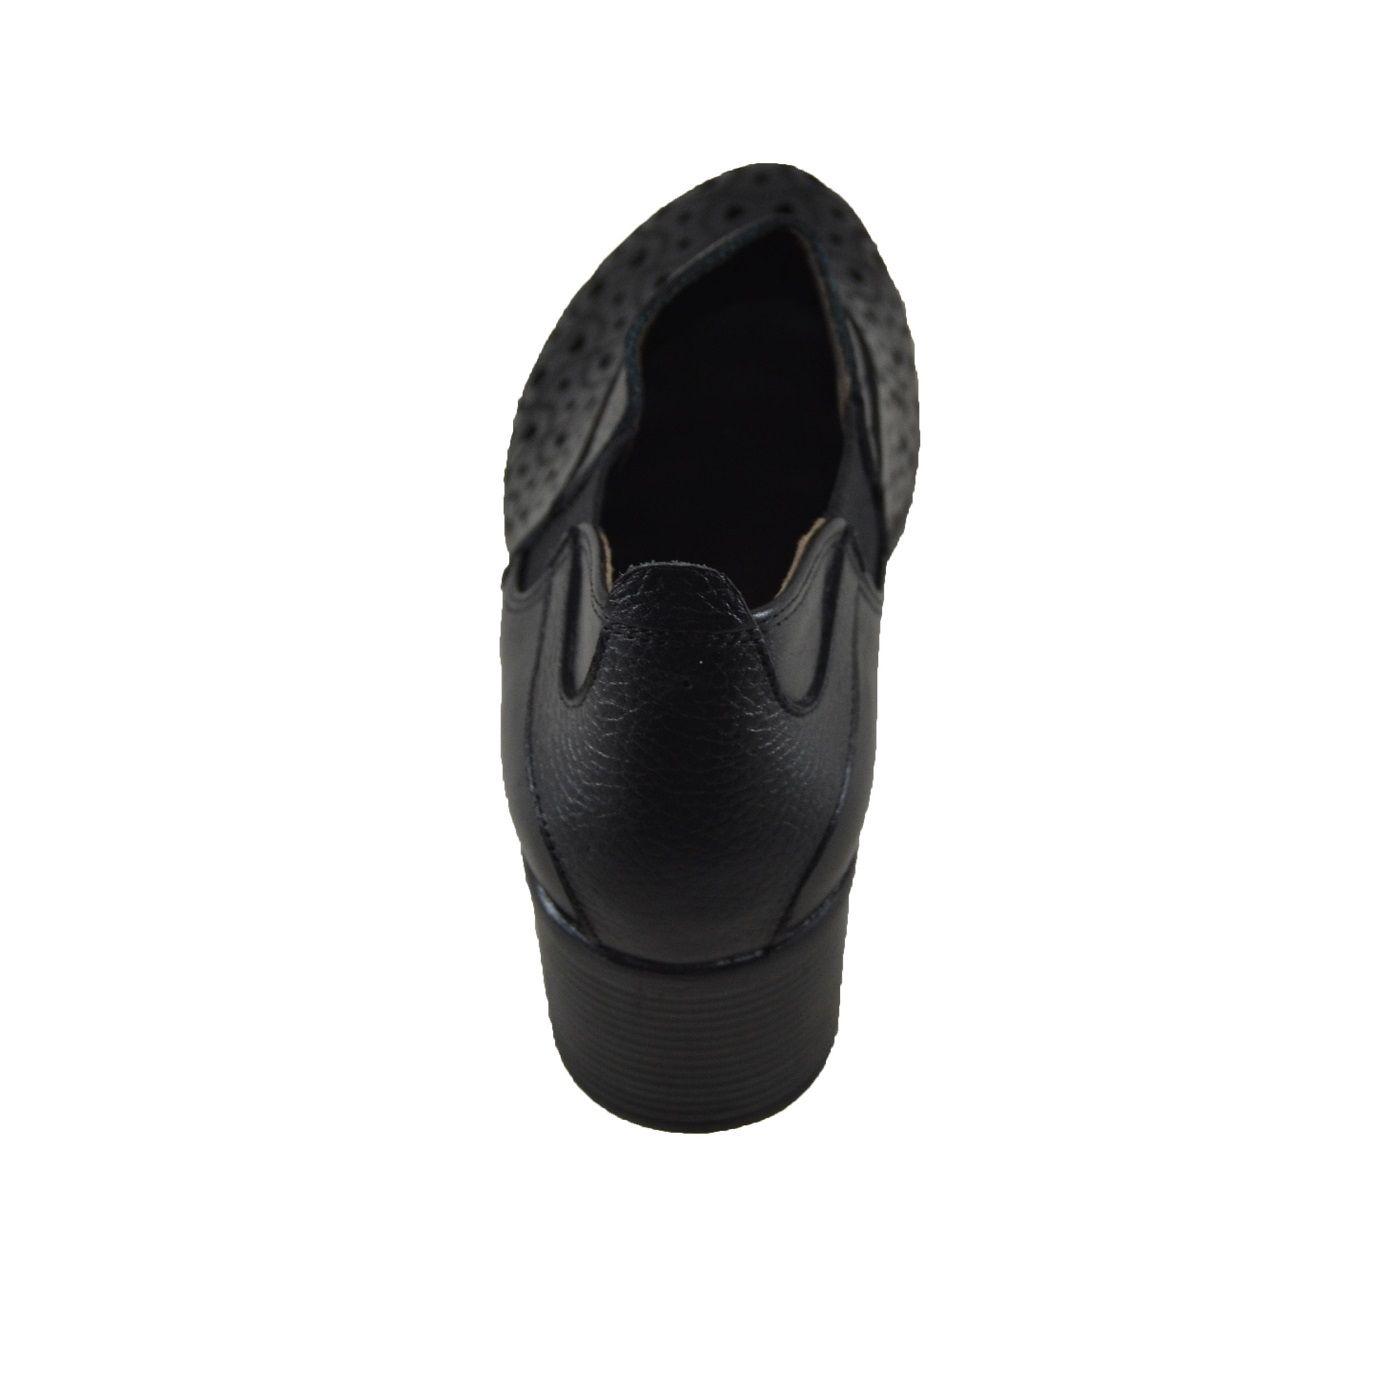 کفش زنانه کد 522 -  - 3